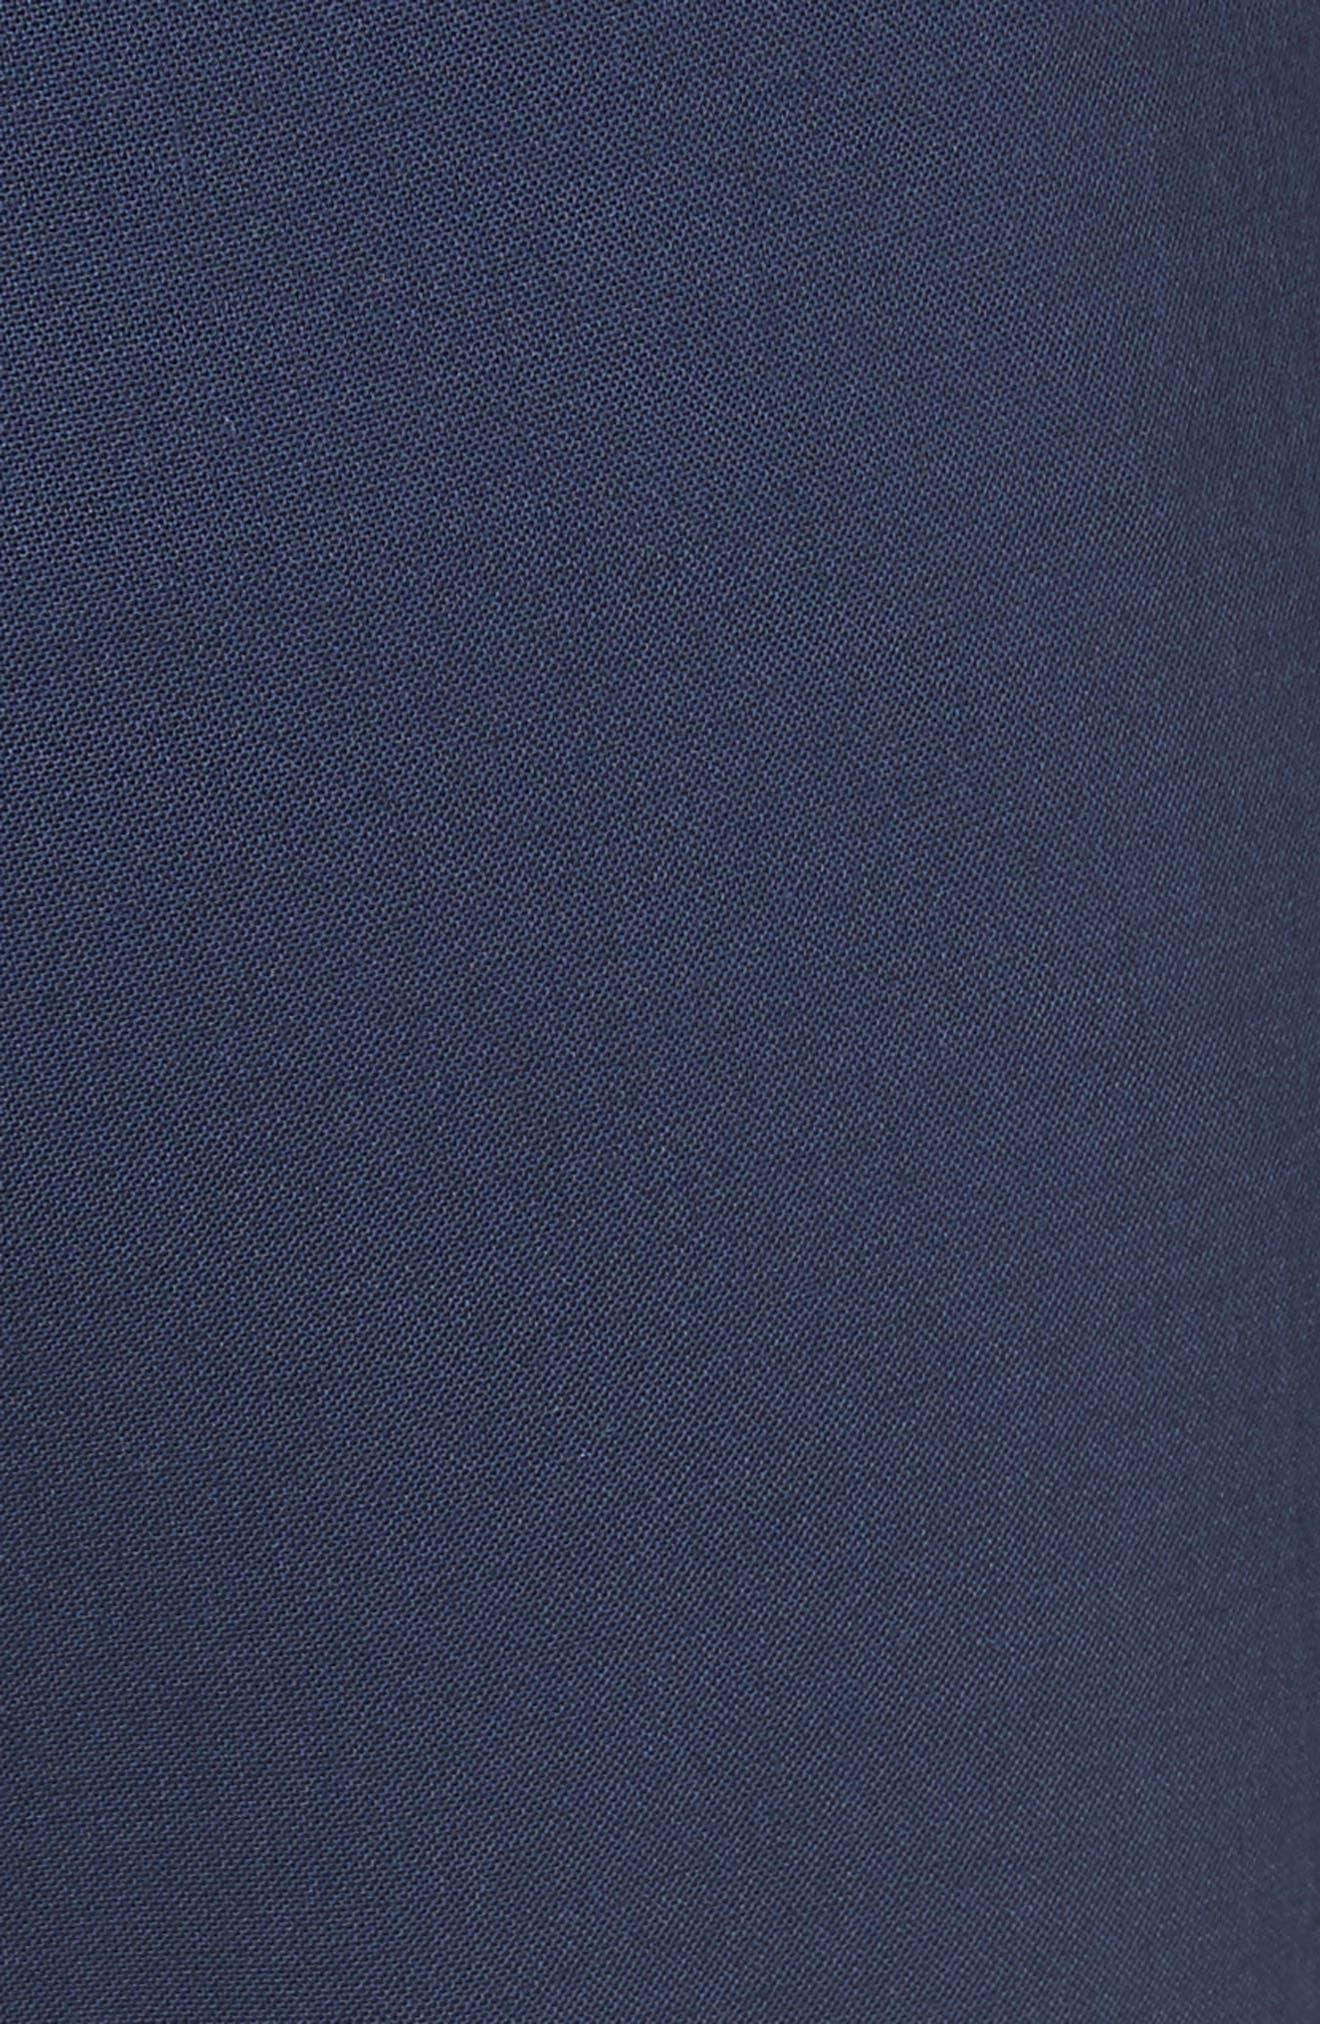 Treeca 2 Good Wool Crop Suit Pants,                             Alternate thumbnail 5, color,                             Sea Blue